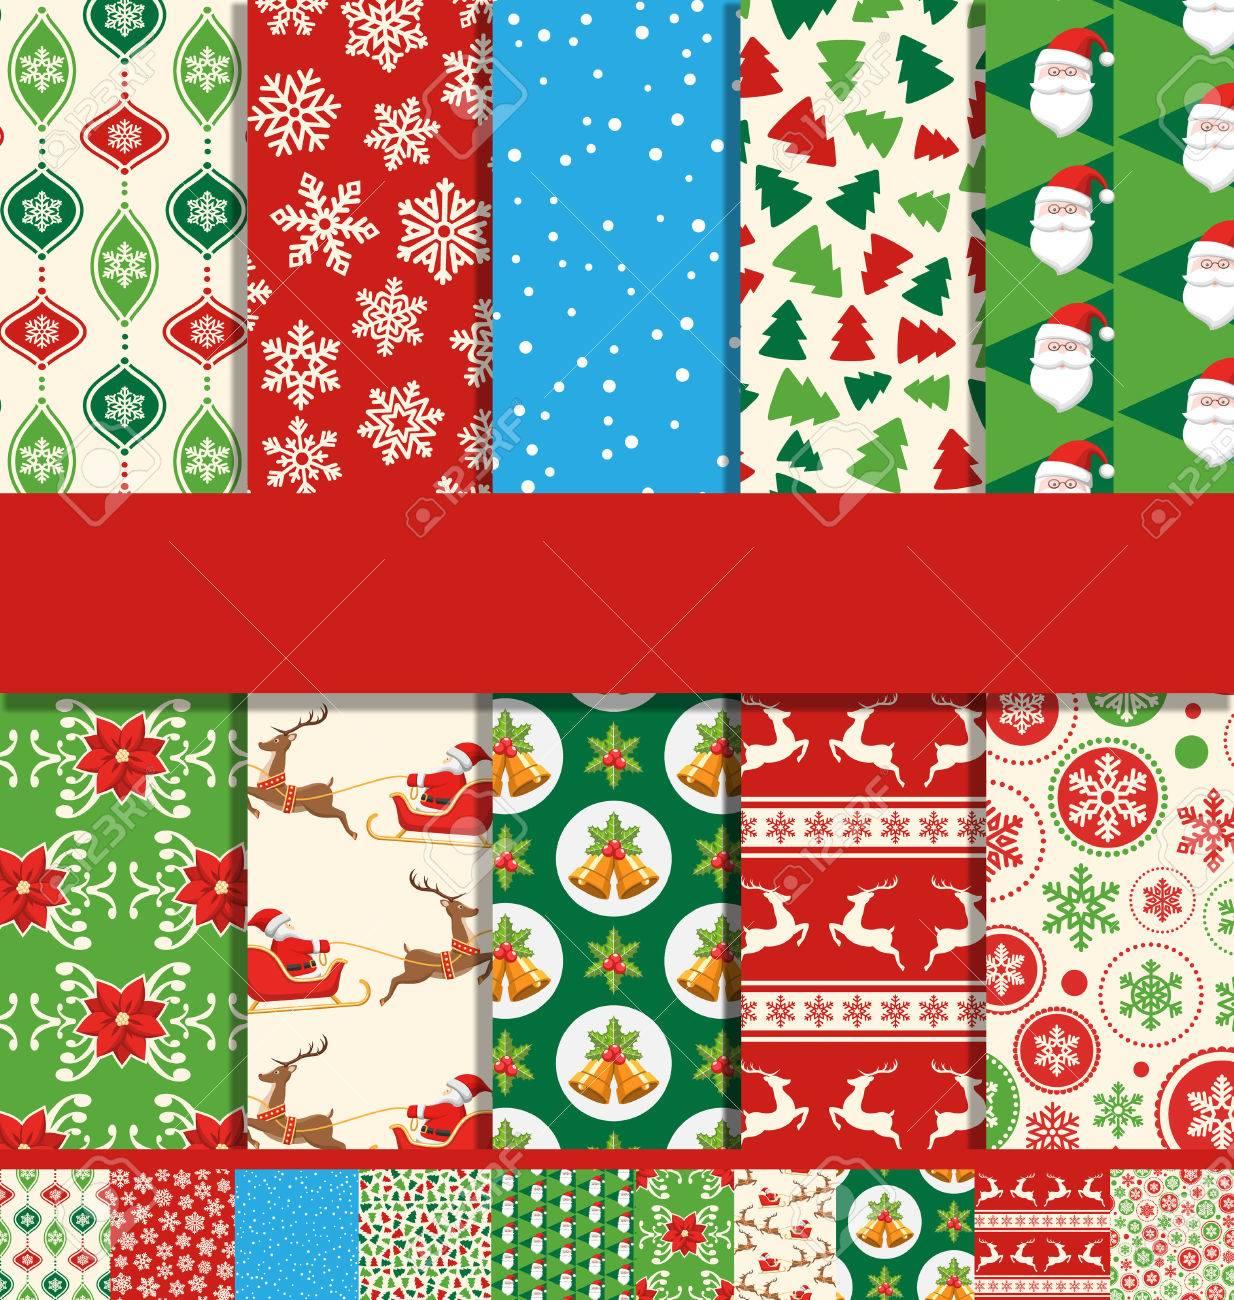 Set of 10 Seamless Bright Fun Christmas Patterns - 48734468